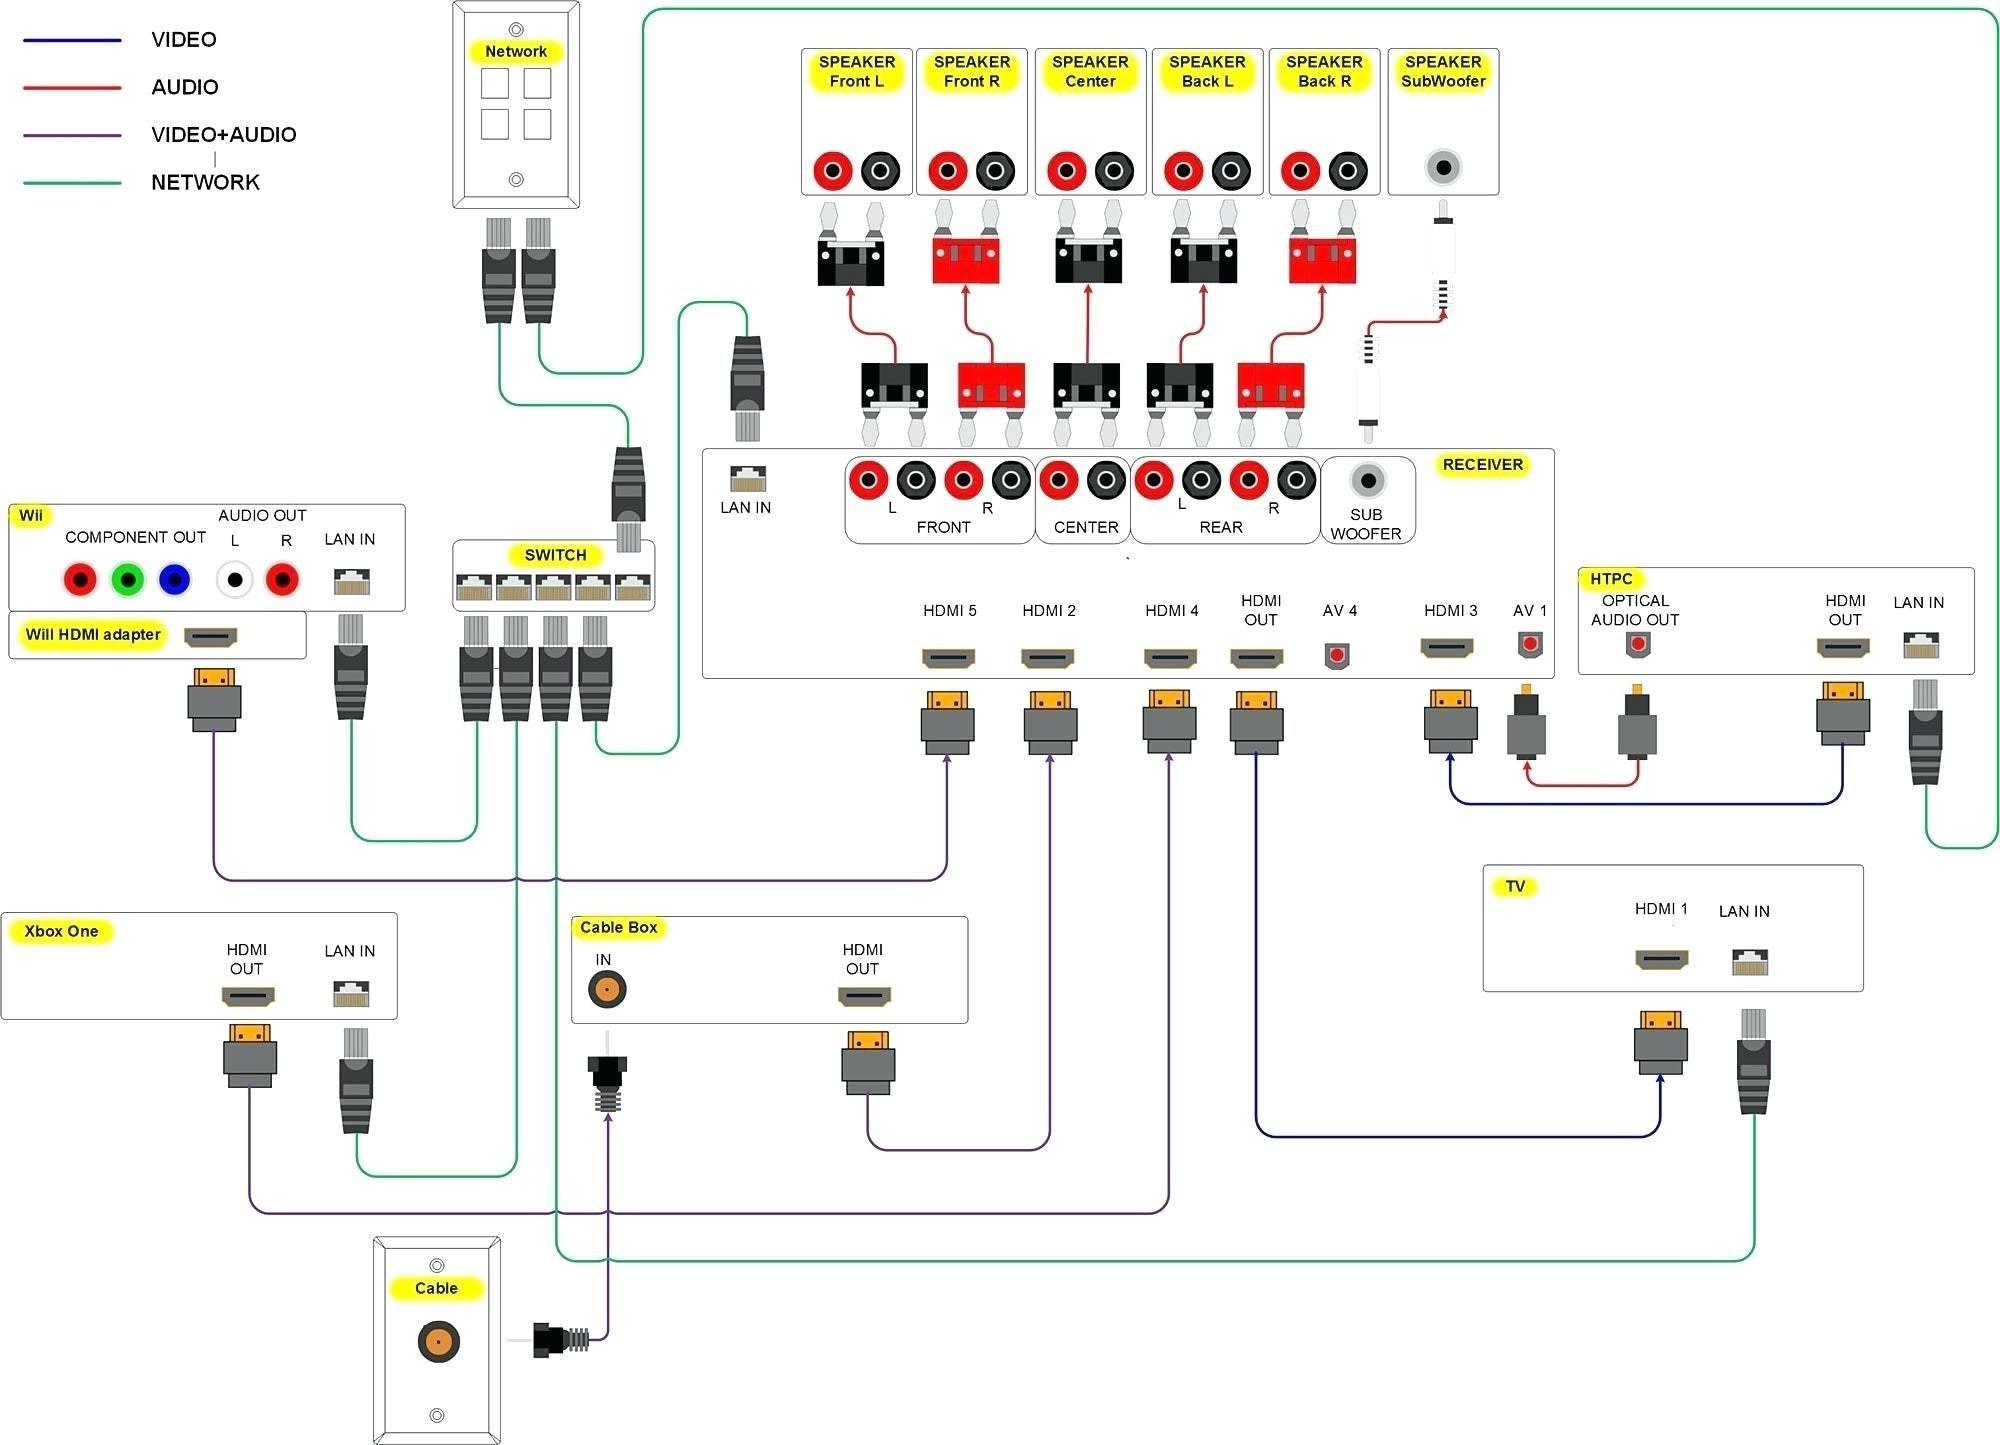 Bogen Paging System Wiring Diagram Bogen Paging System Wiring Diagram 4k Wallpapers Design Of Bogen Paging System Wiring Diagram